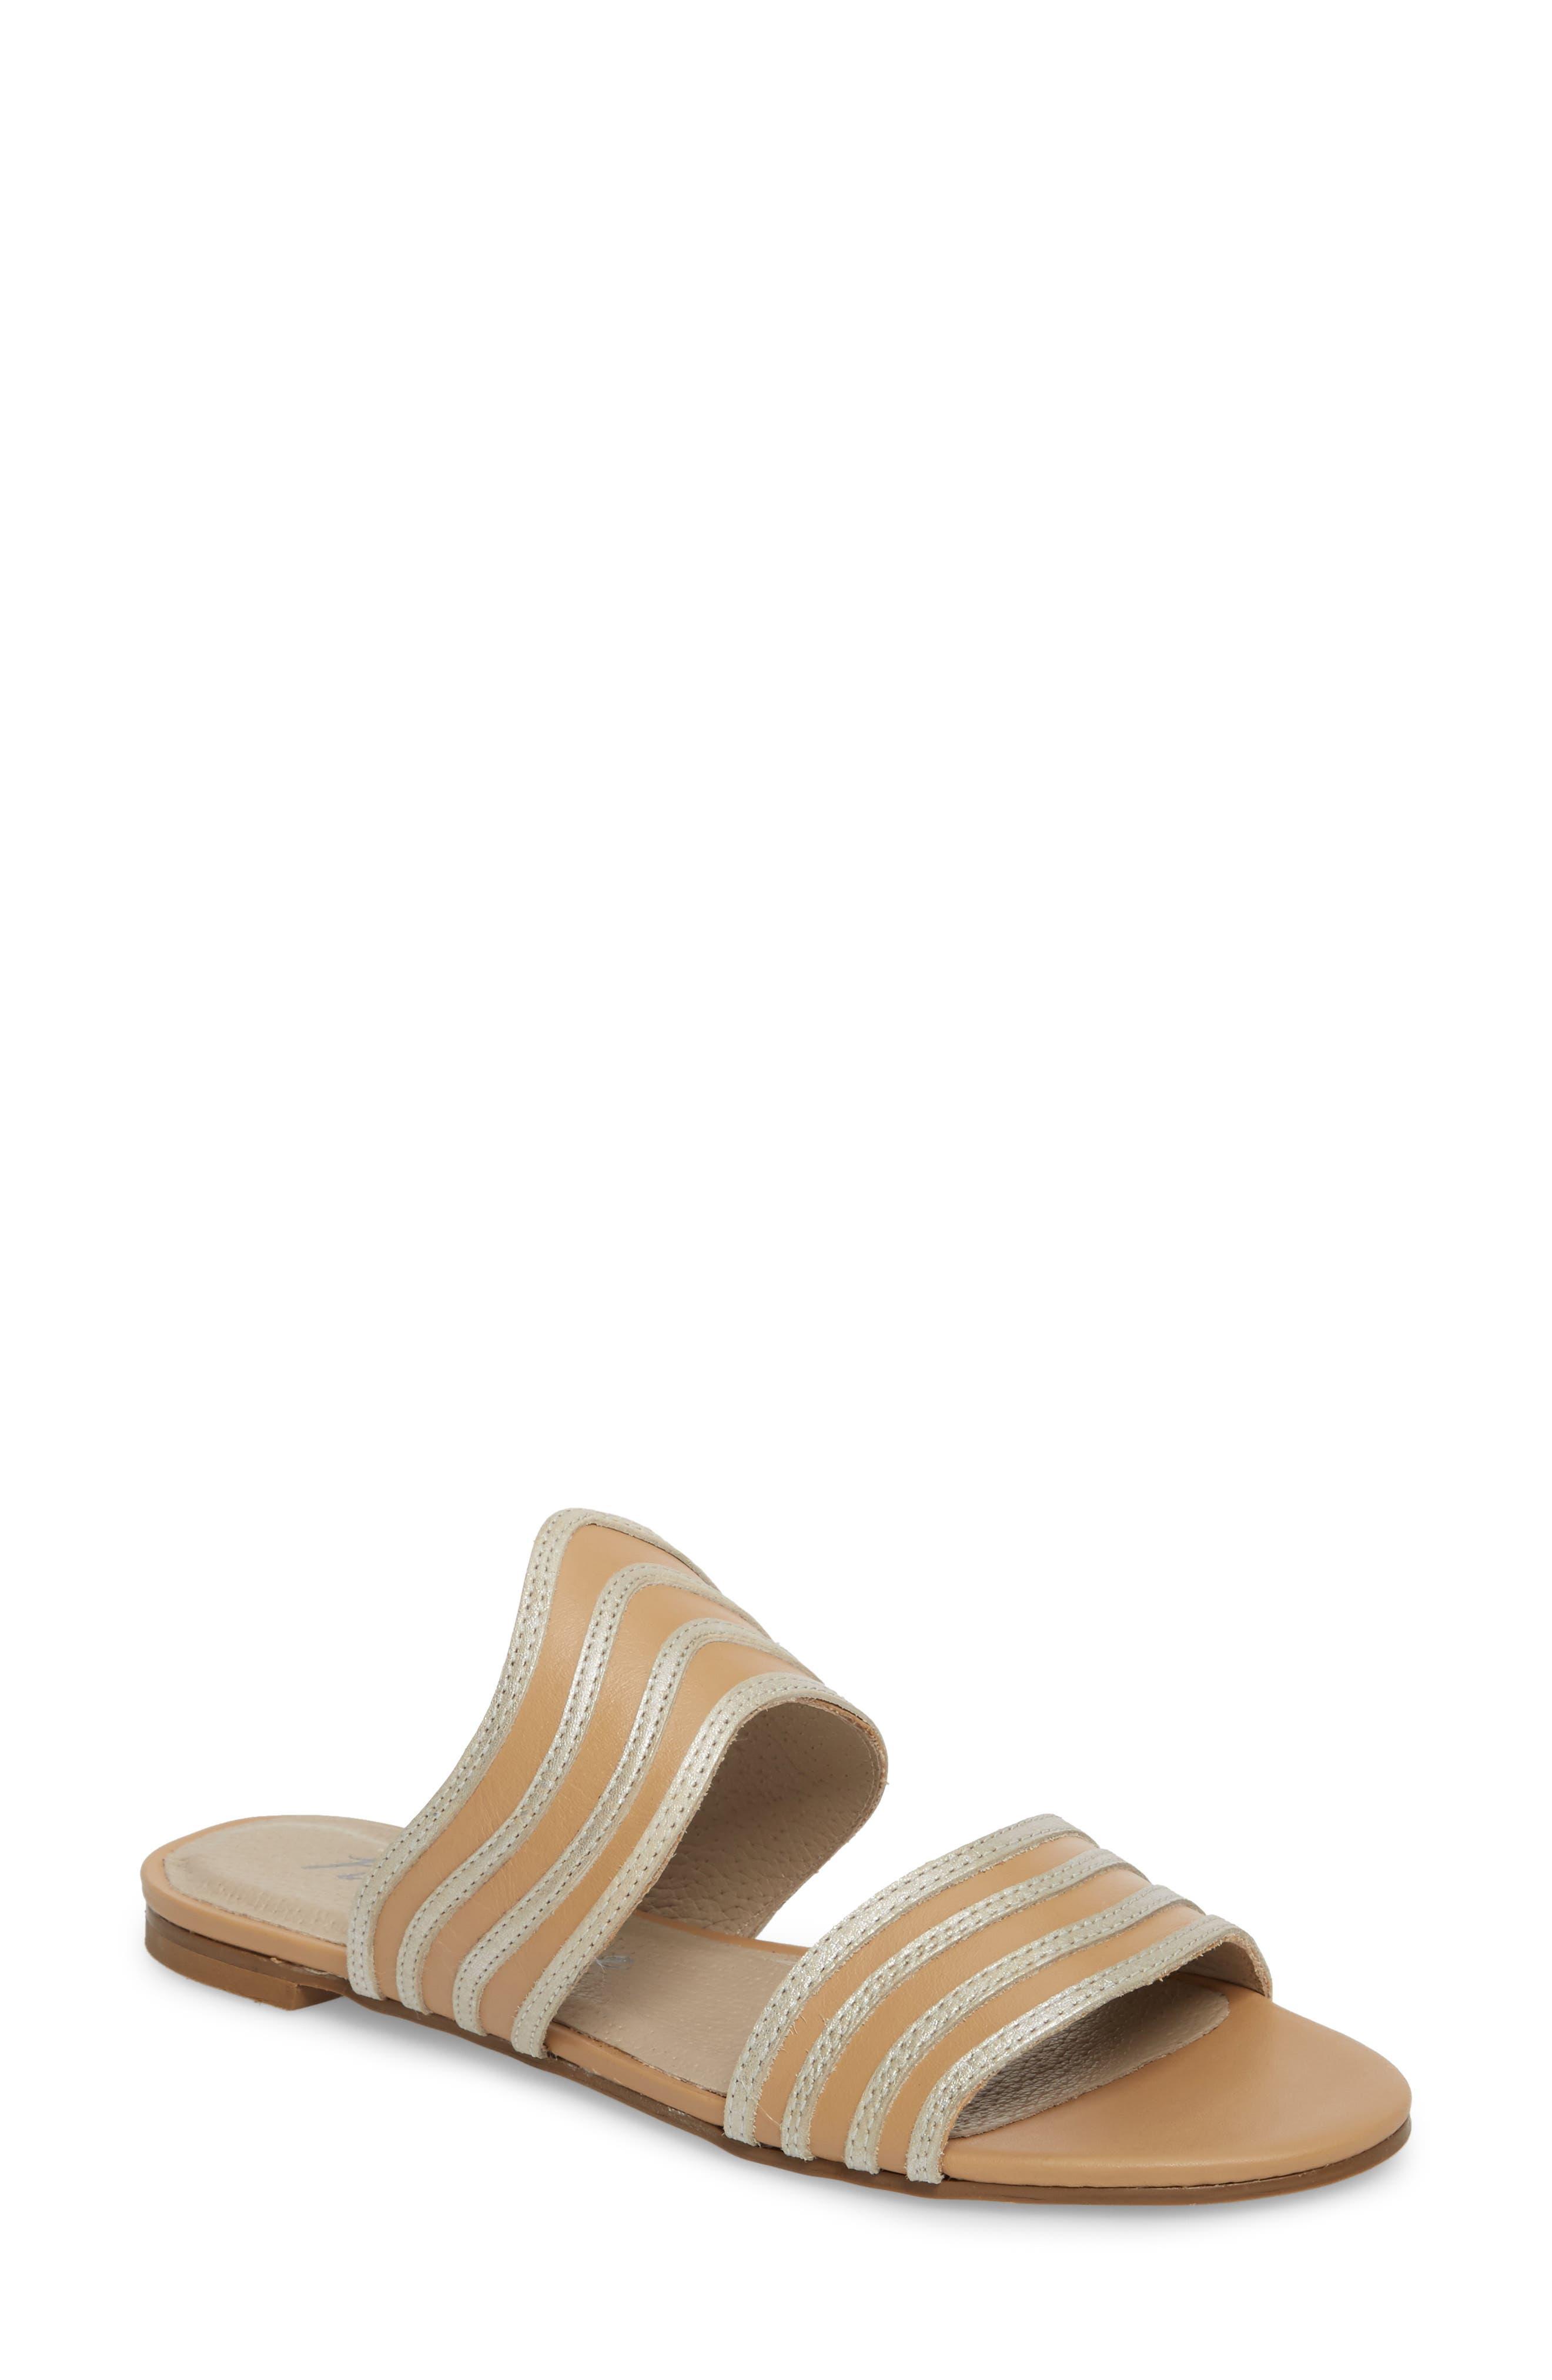 Russo Slide Sandal,                         Main,                         color, Natural/ Silver Leather